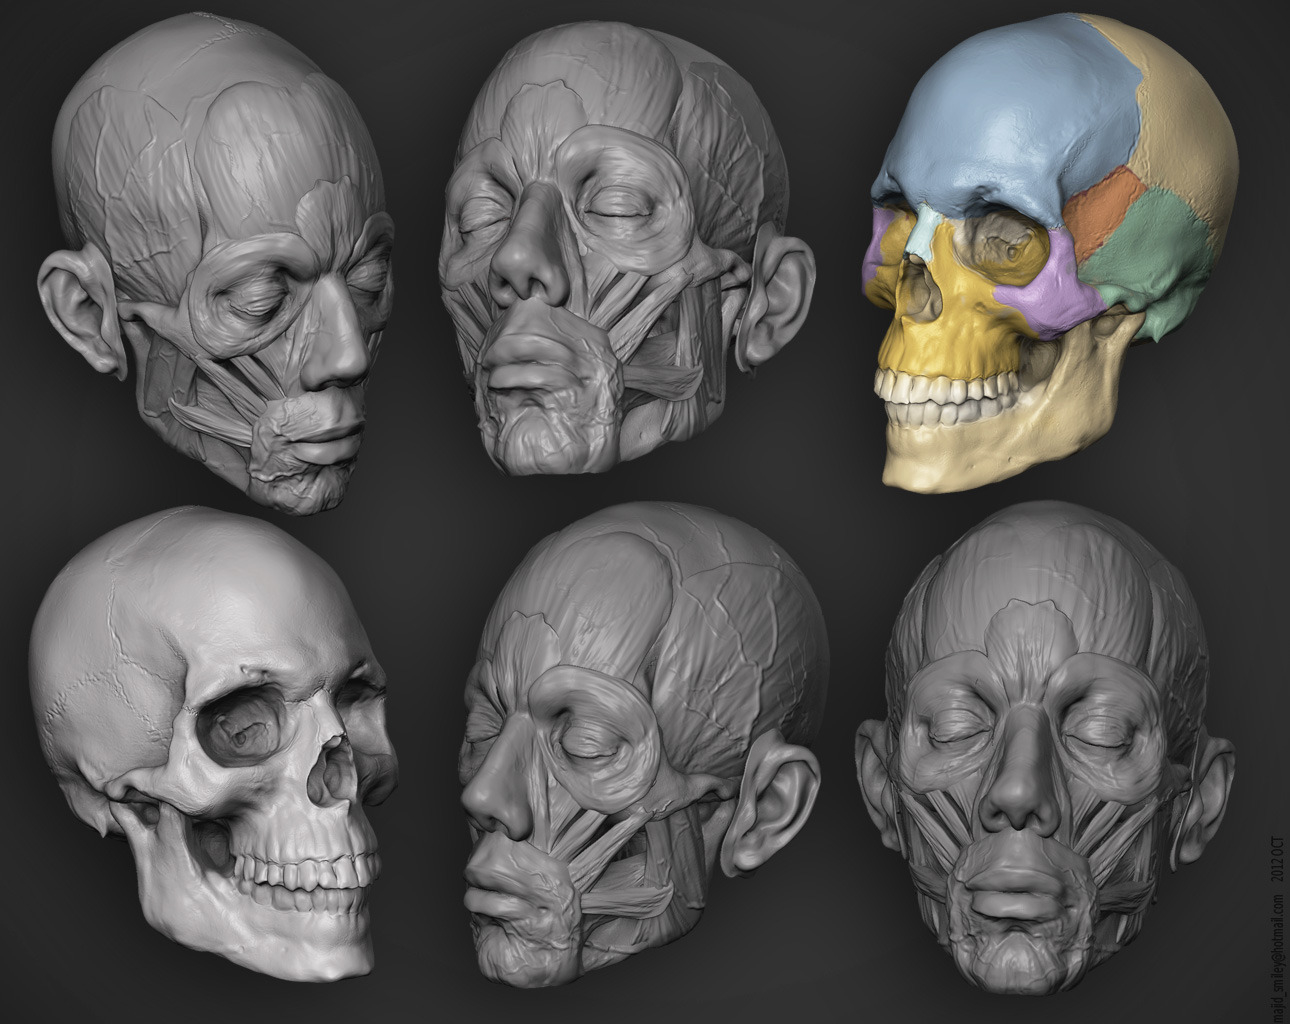 Majid smiley anatomy study 1 c6e32d29 qbfe